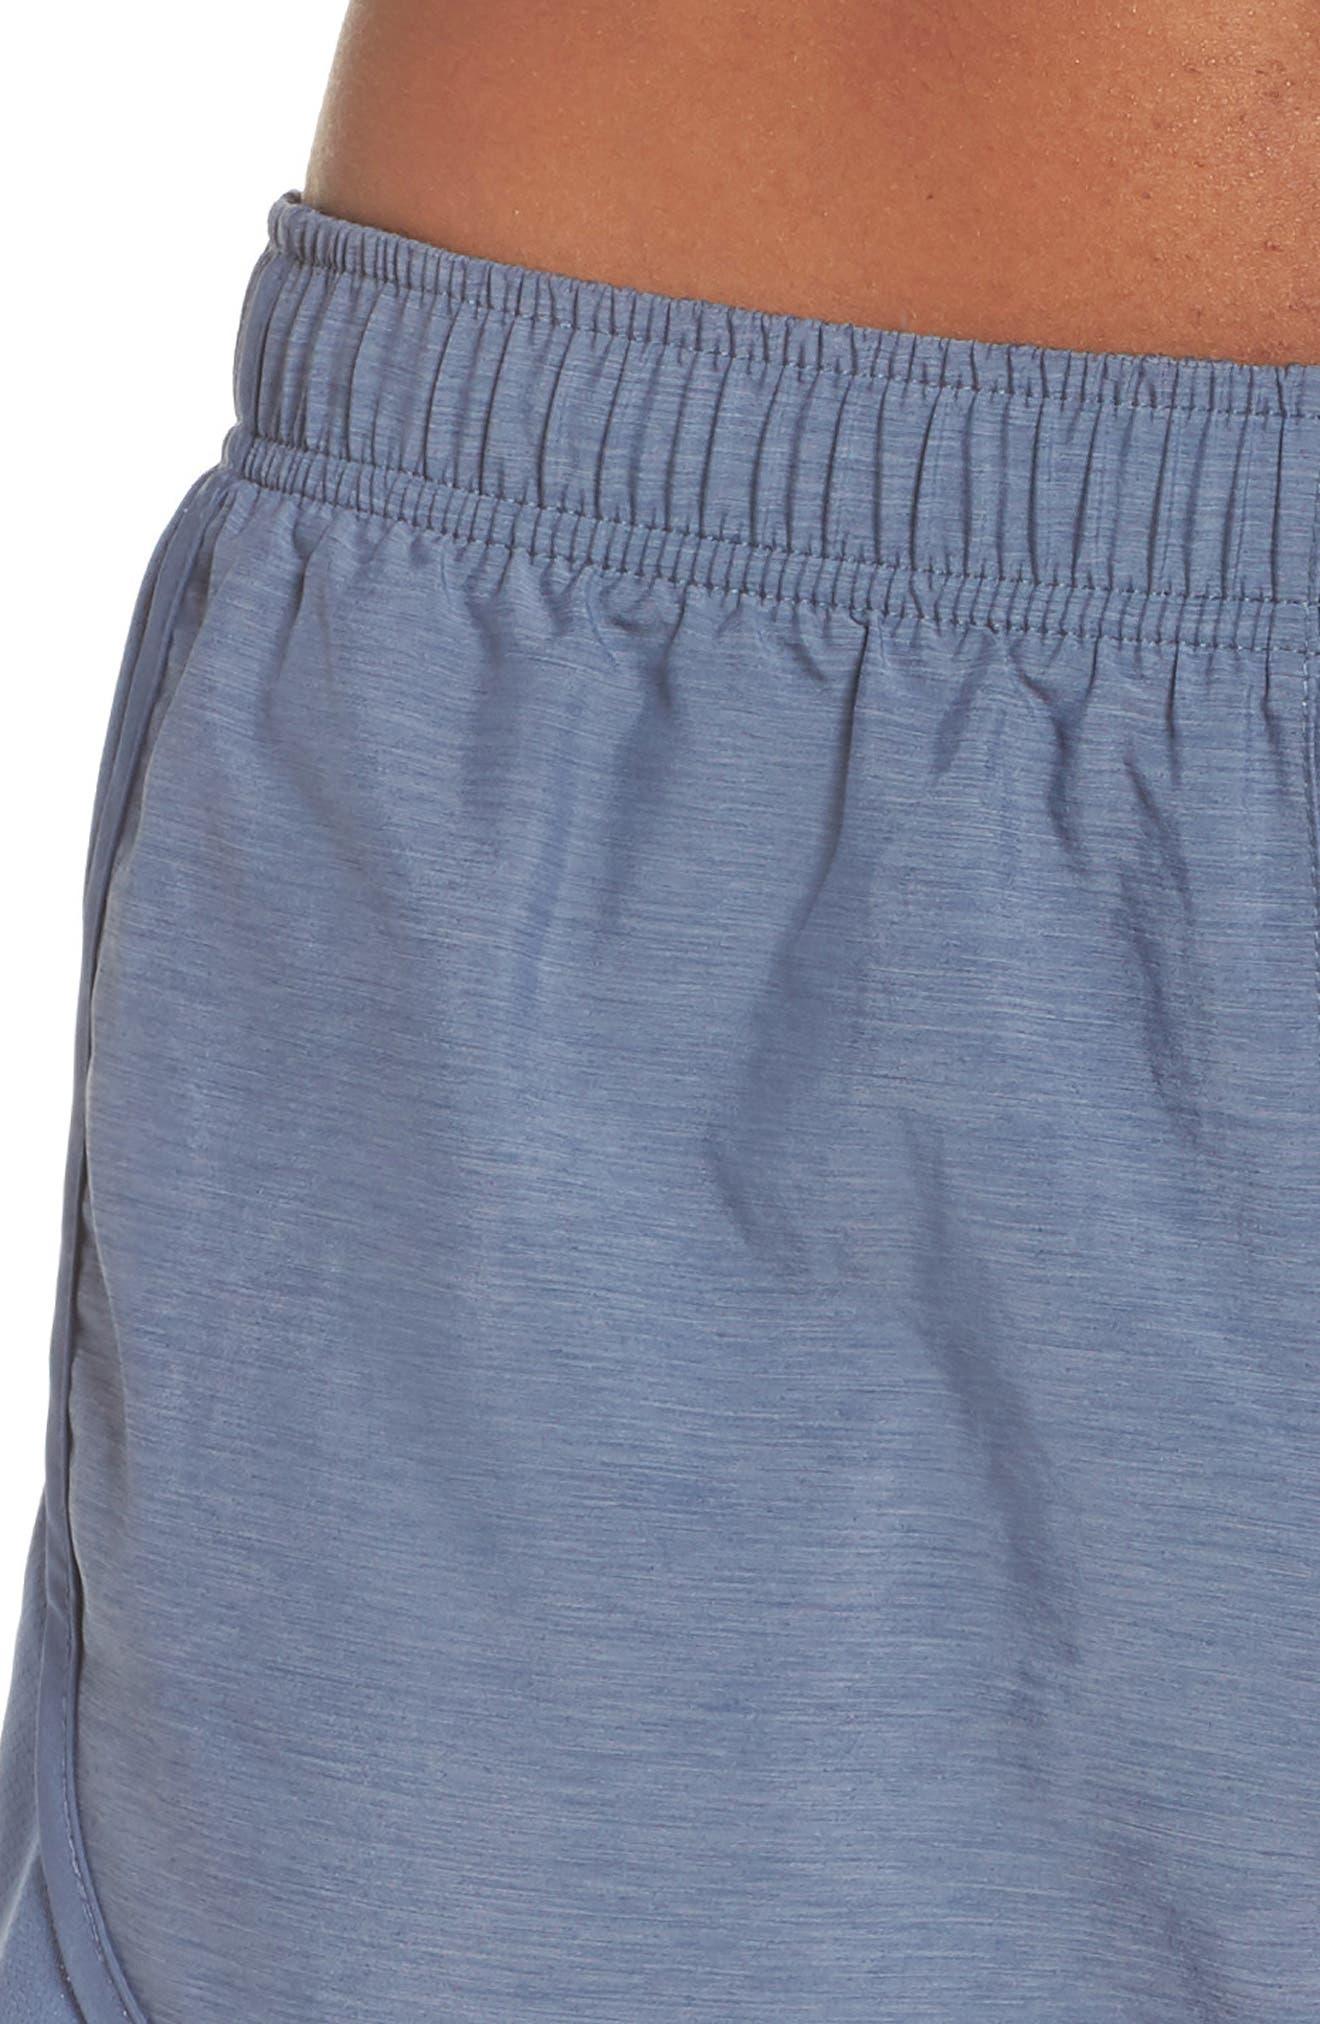 Dry Tempo Running Shorts,                             Alternate thumbnail 387, color,